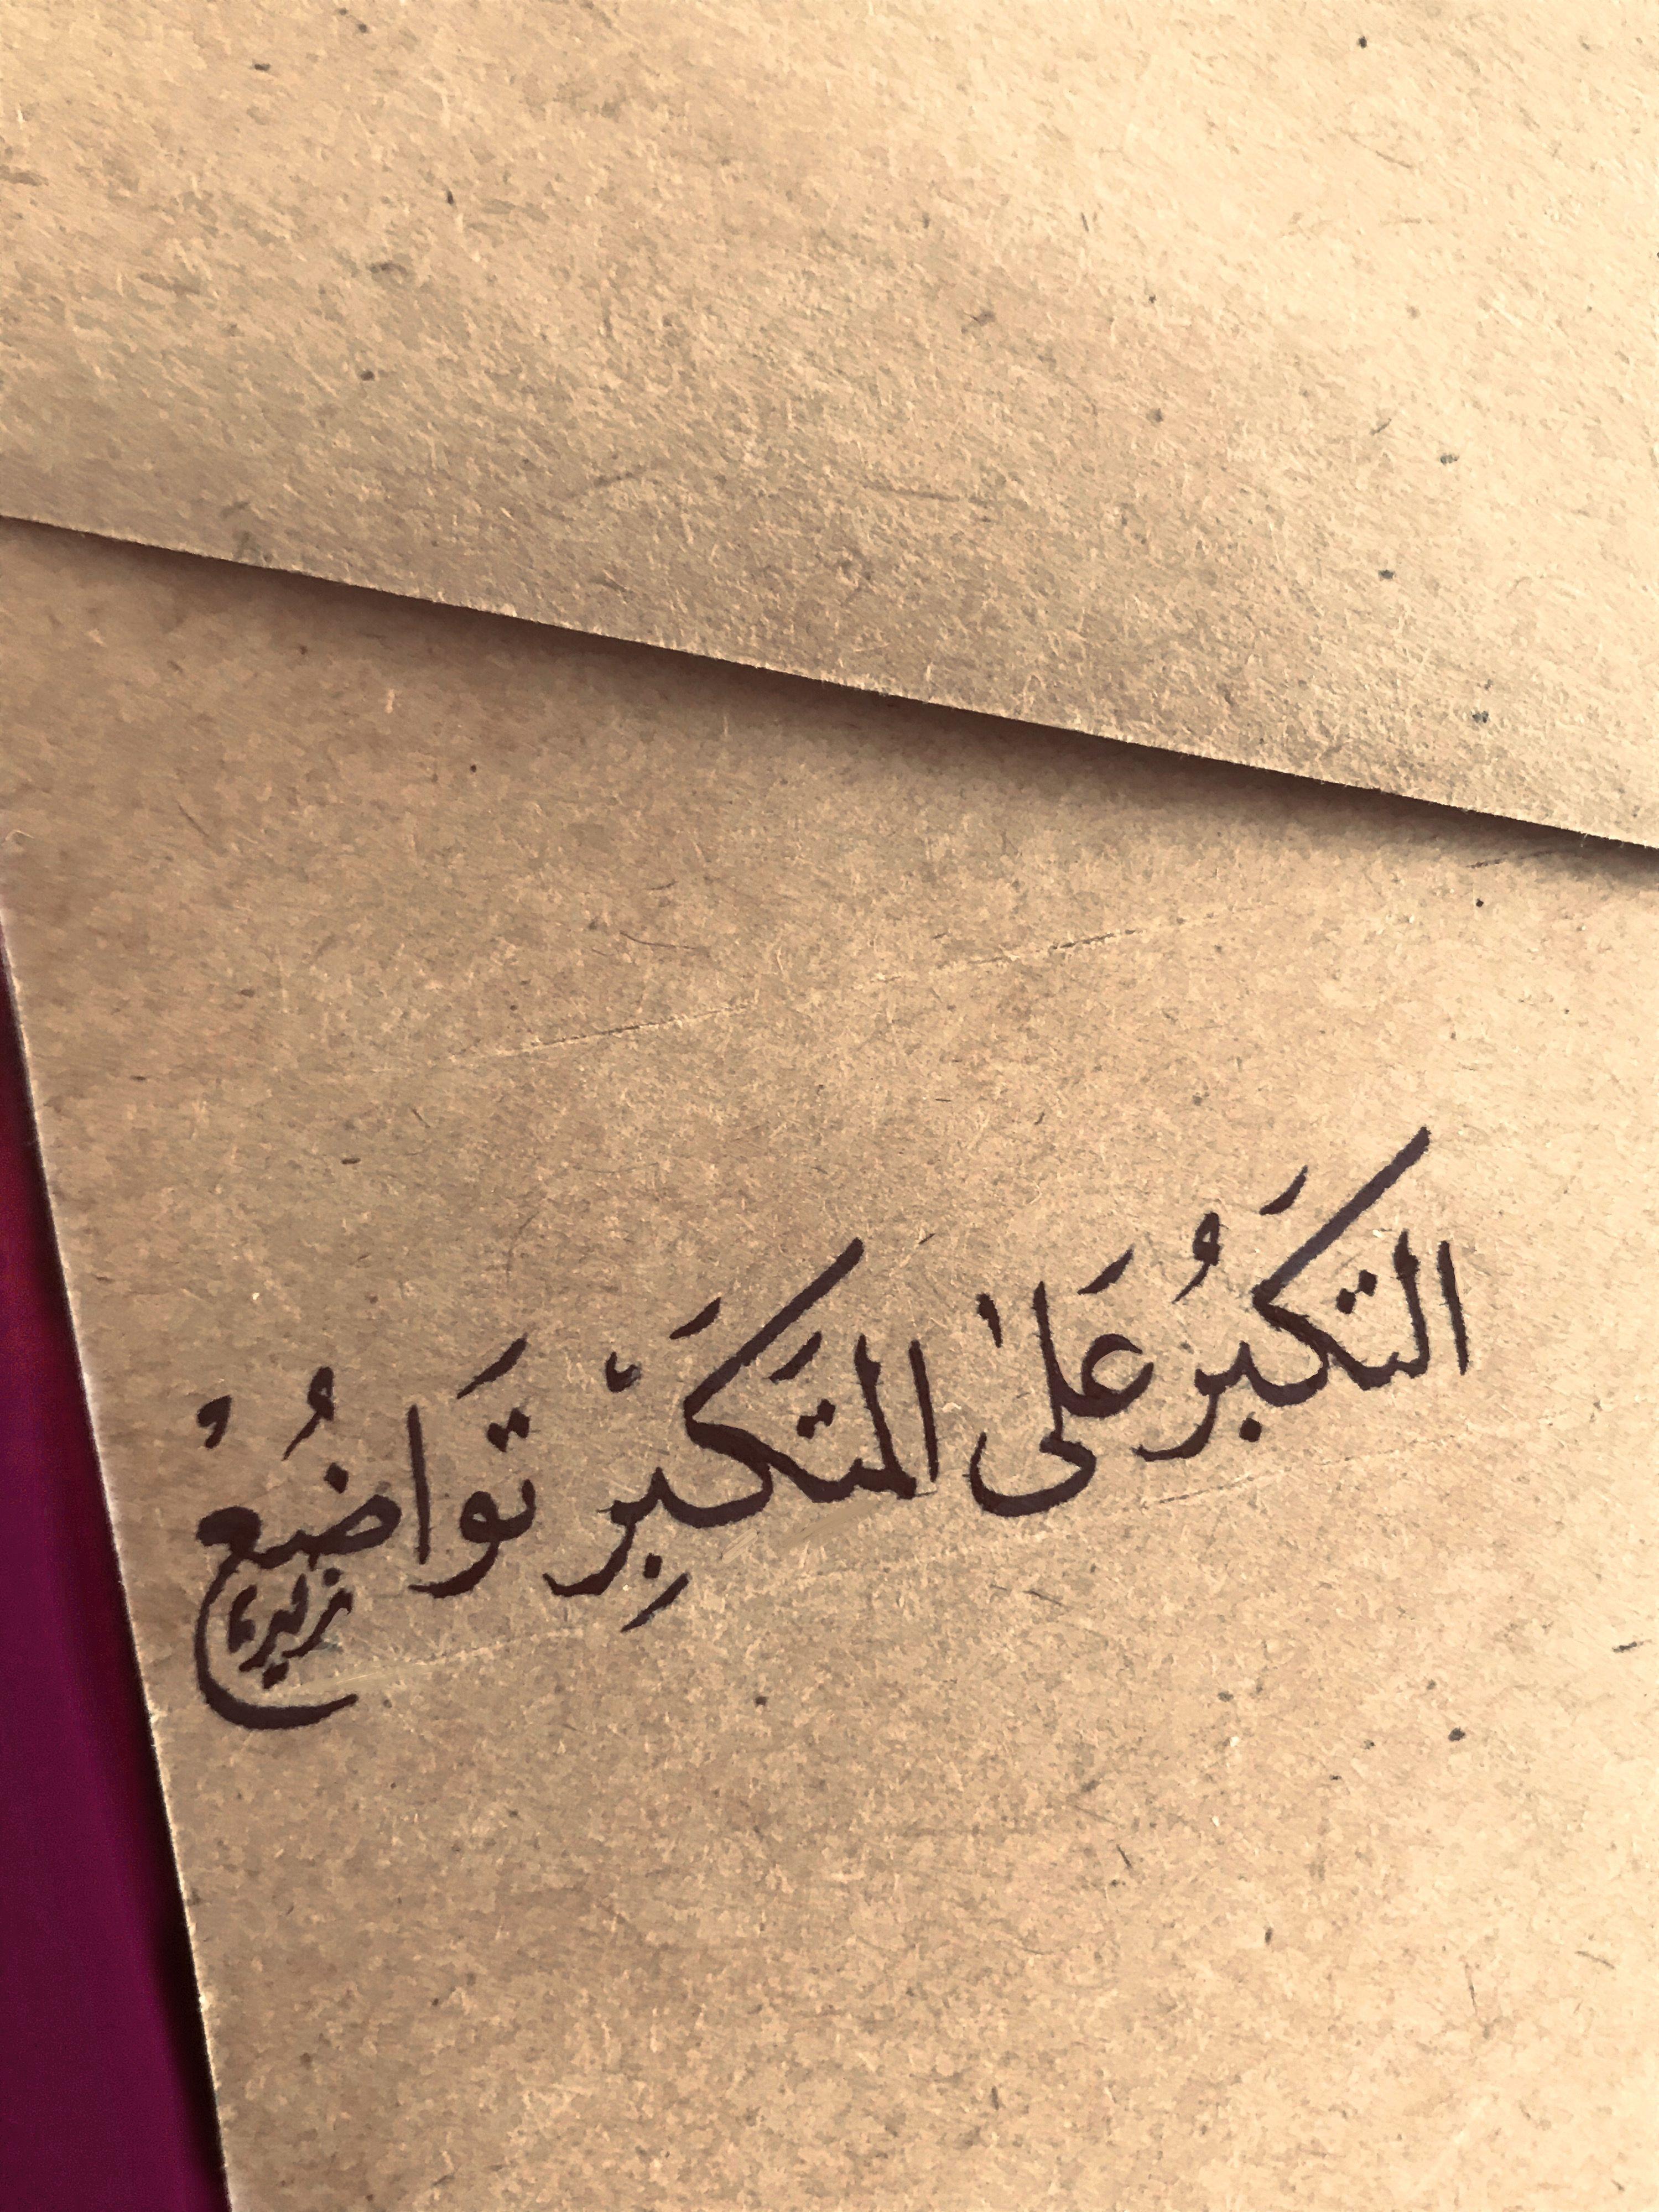 Zaid On Instagram خط النسخ ٠ ٥ ملم Calligraphy Door Mat Writing